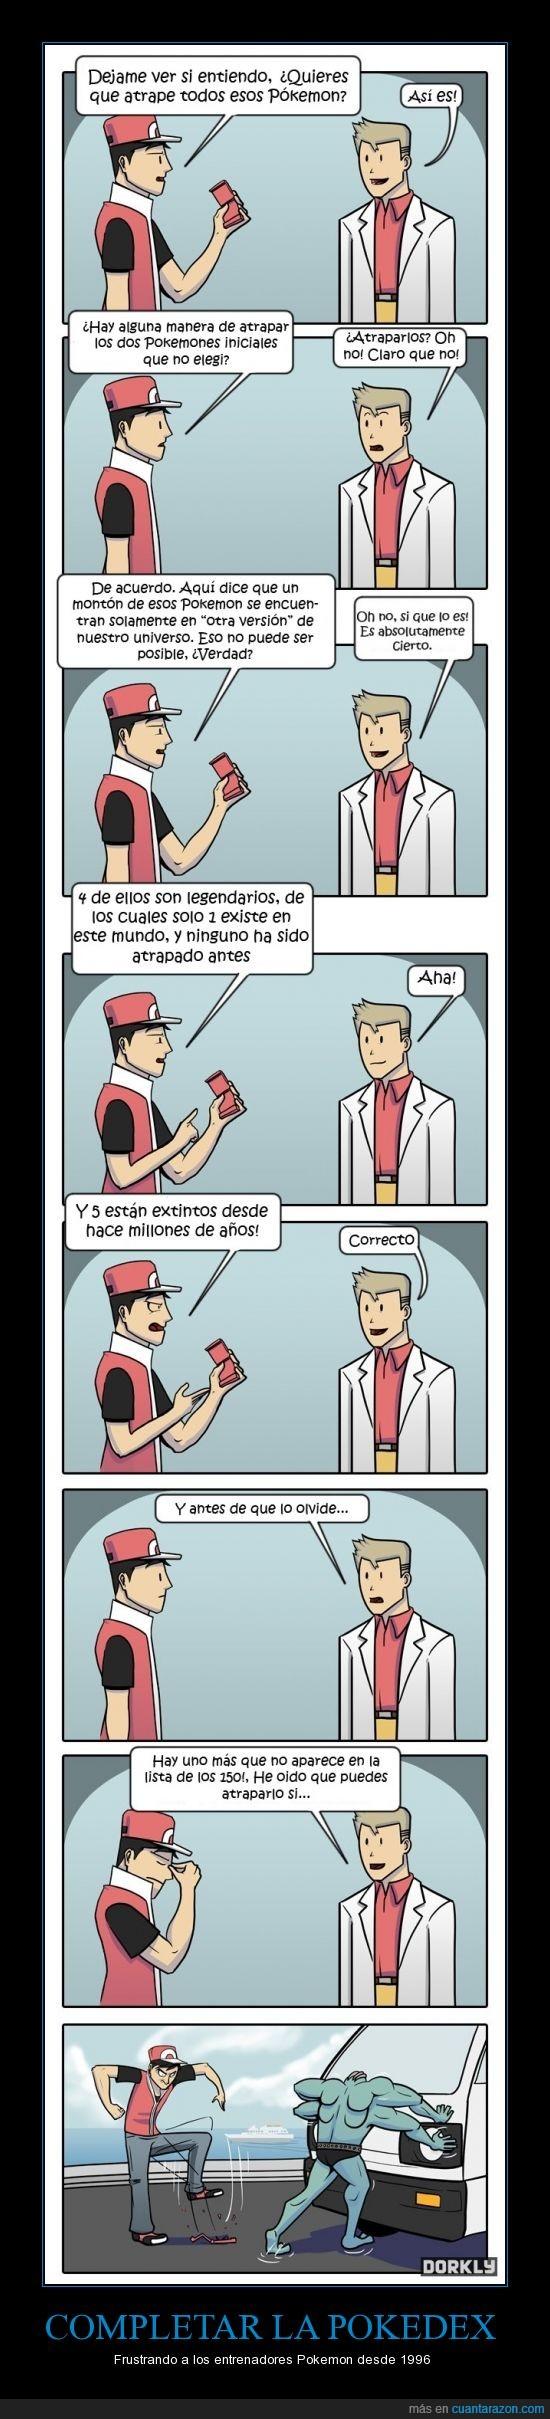 ash,atrapar,oak,pokedex,pokemon,red